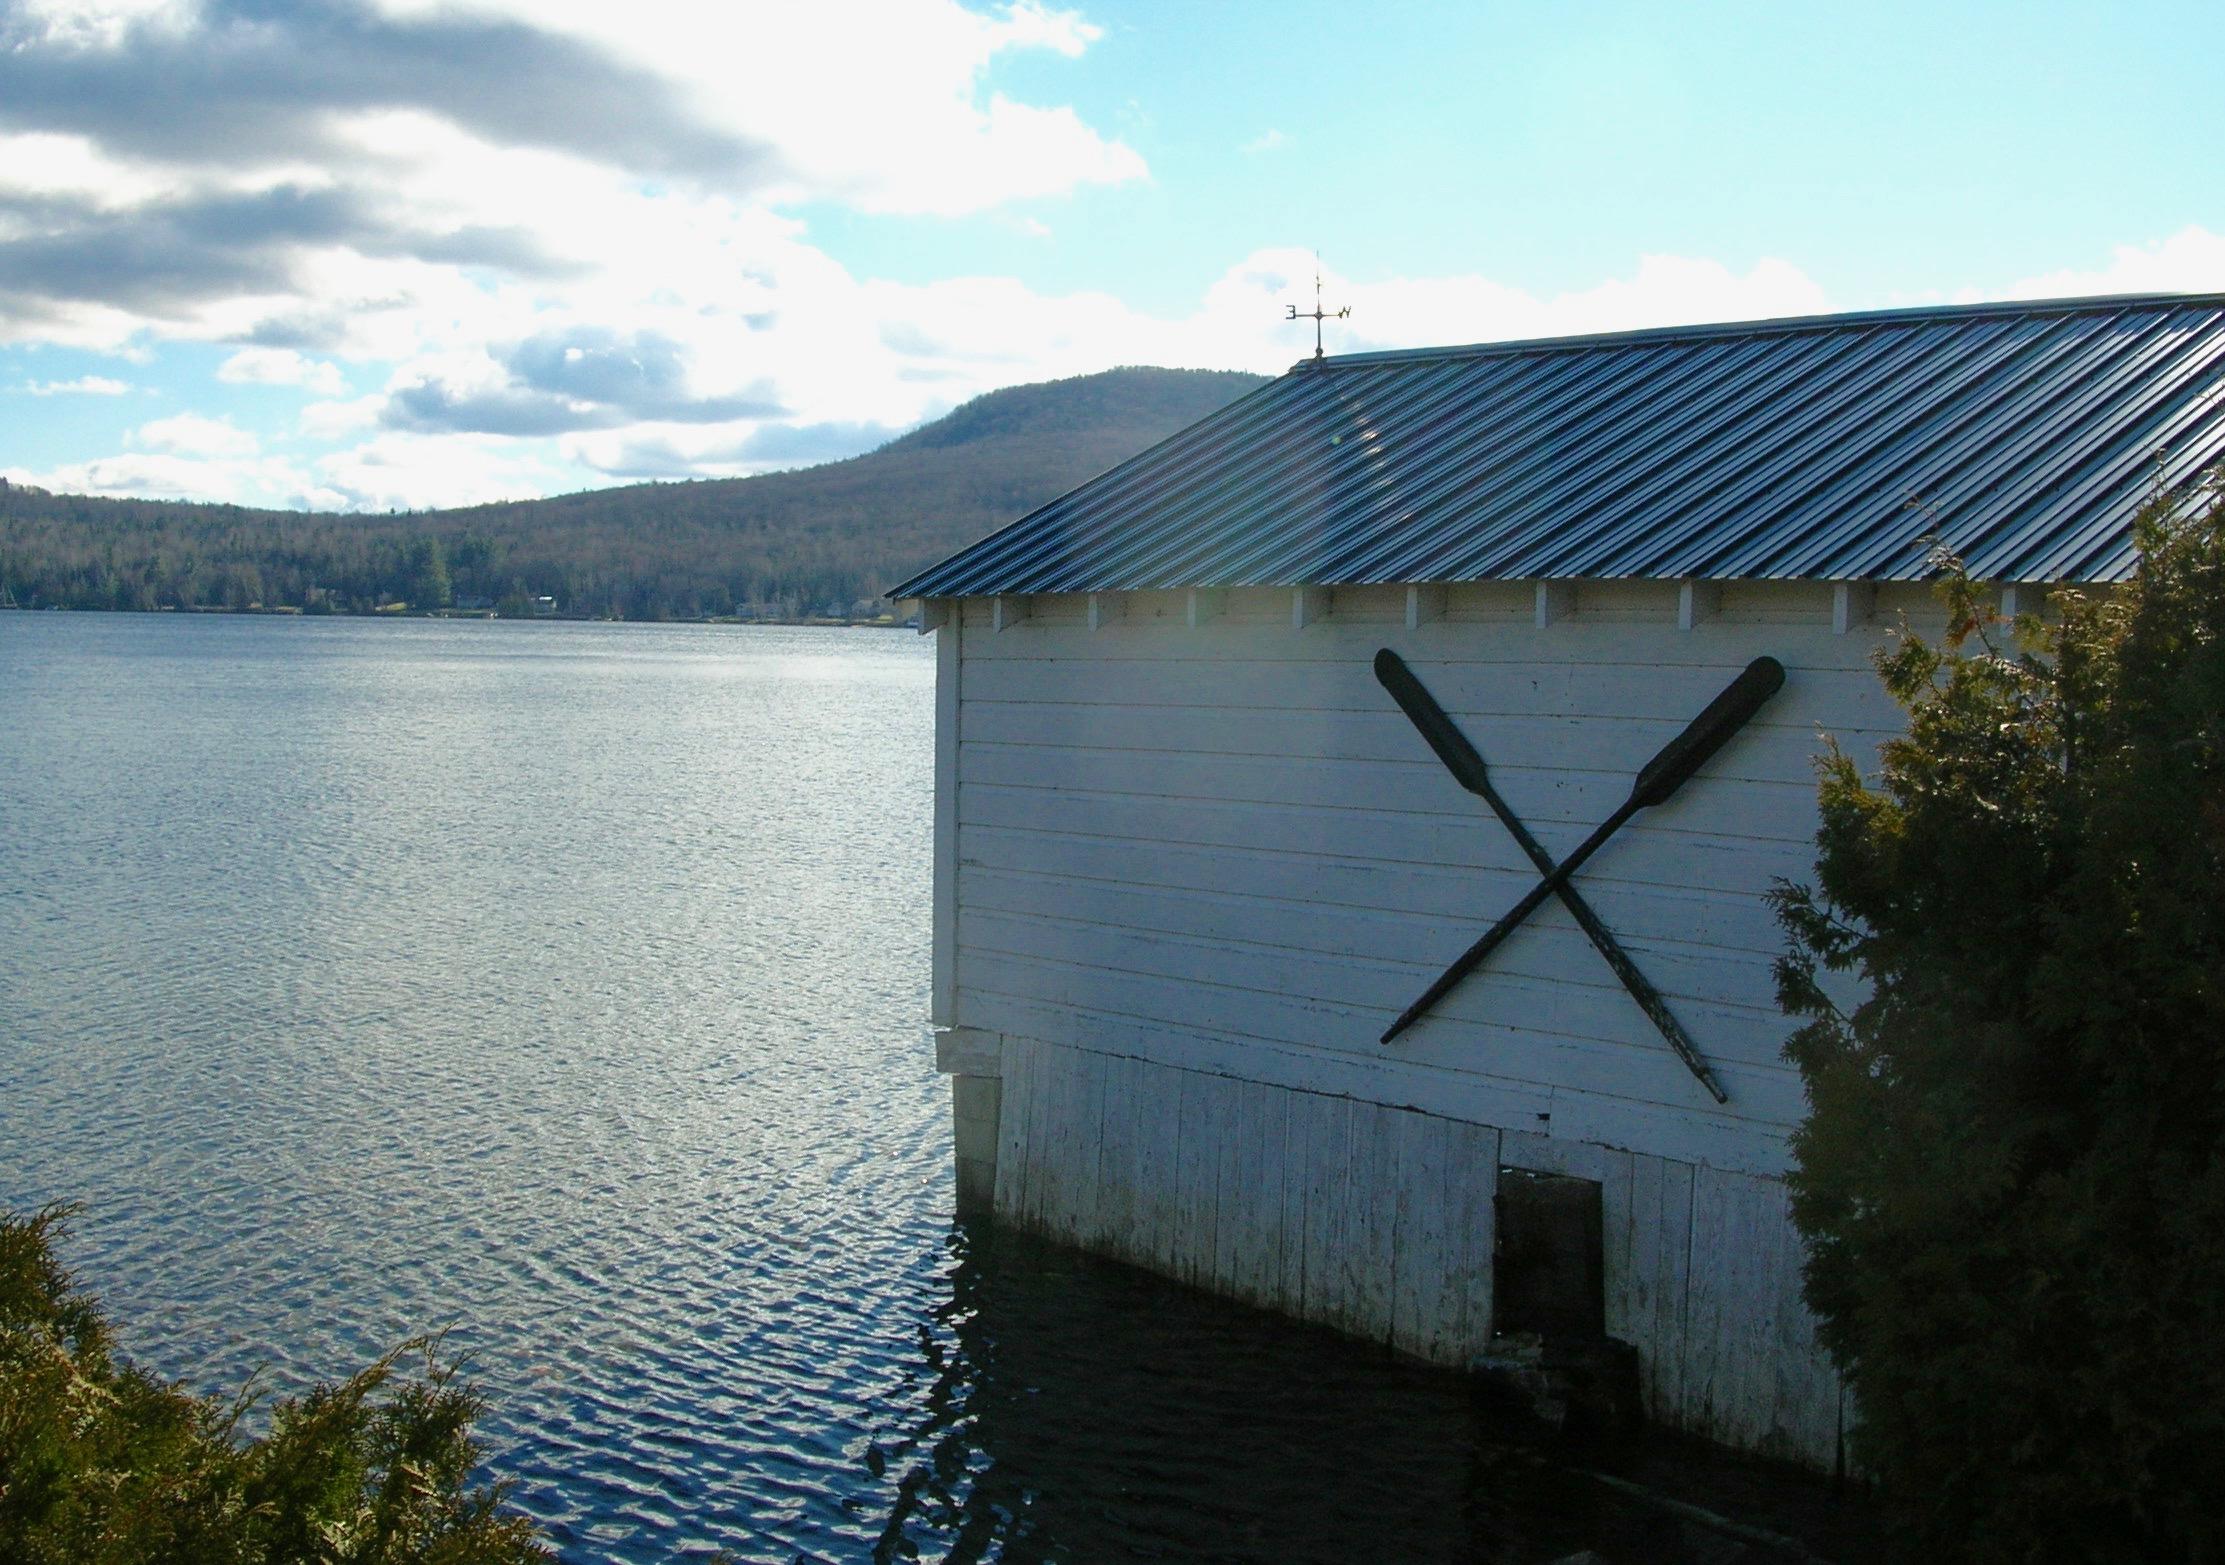 oars at lakeside